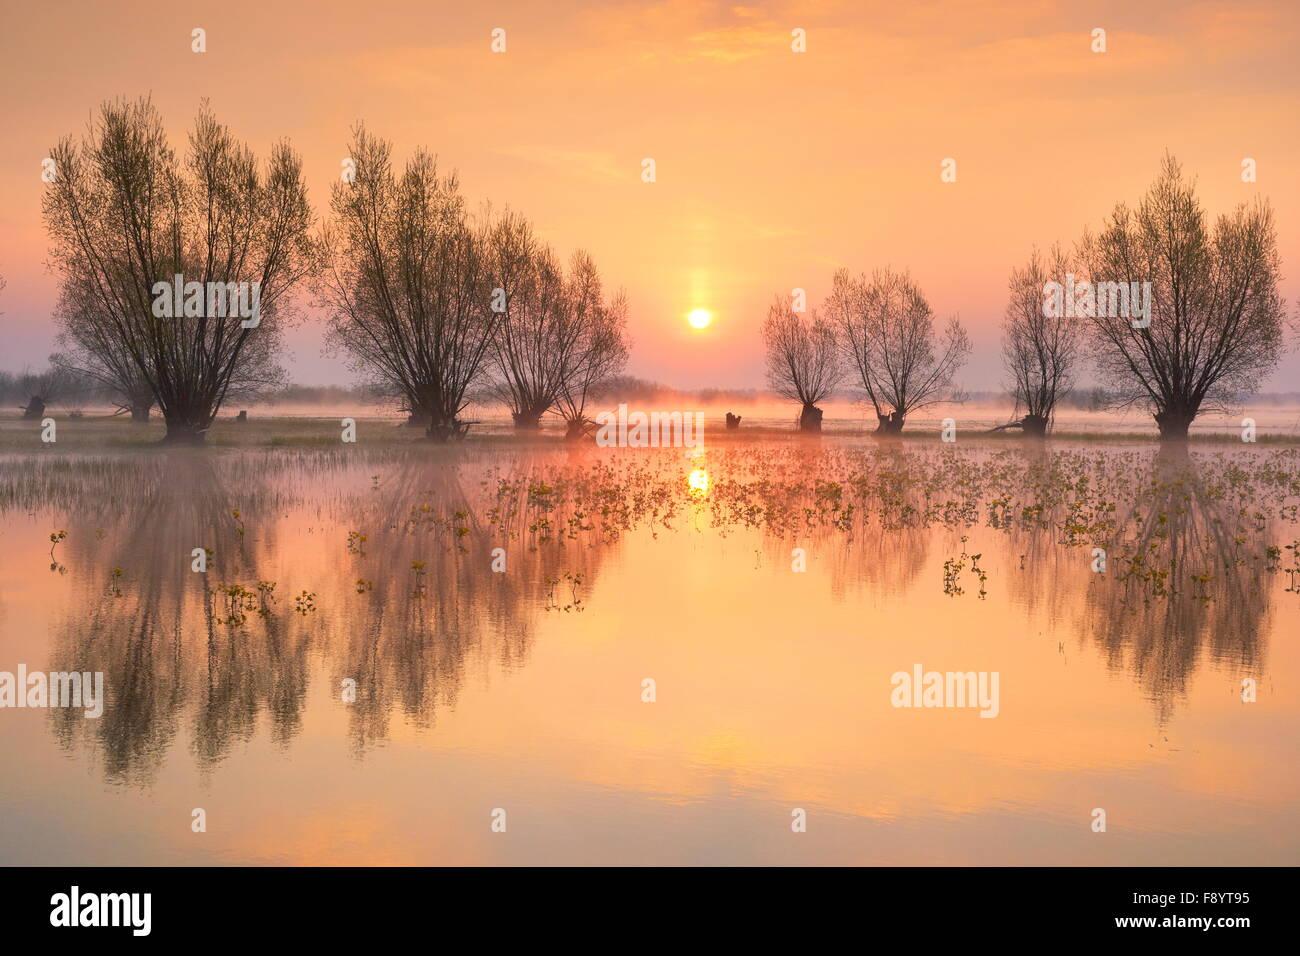 Sunrise-Landschaften im Nationalpark Biebrza-Flusstal, Polen Stockbild